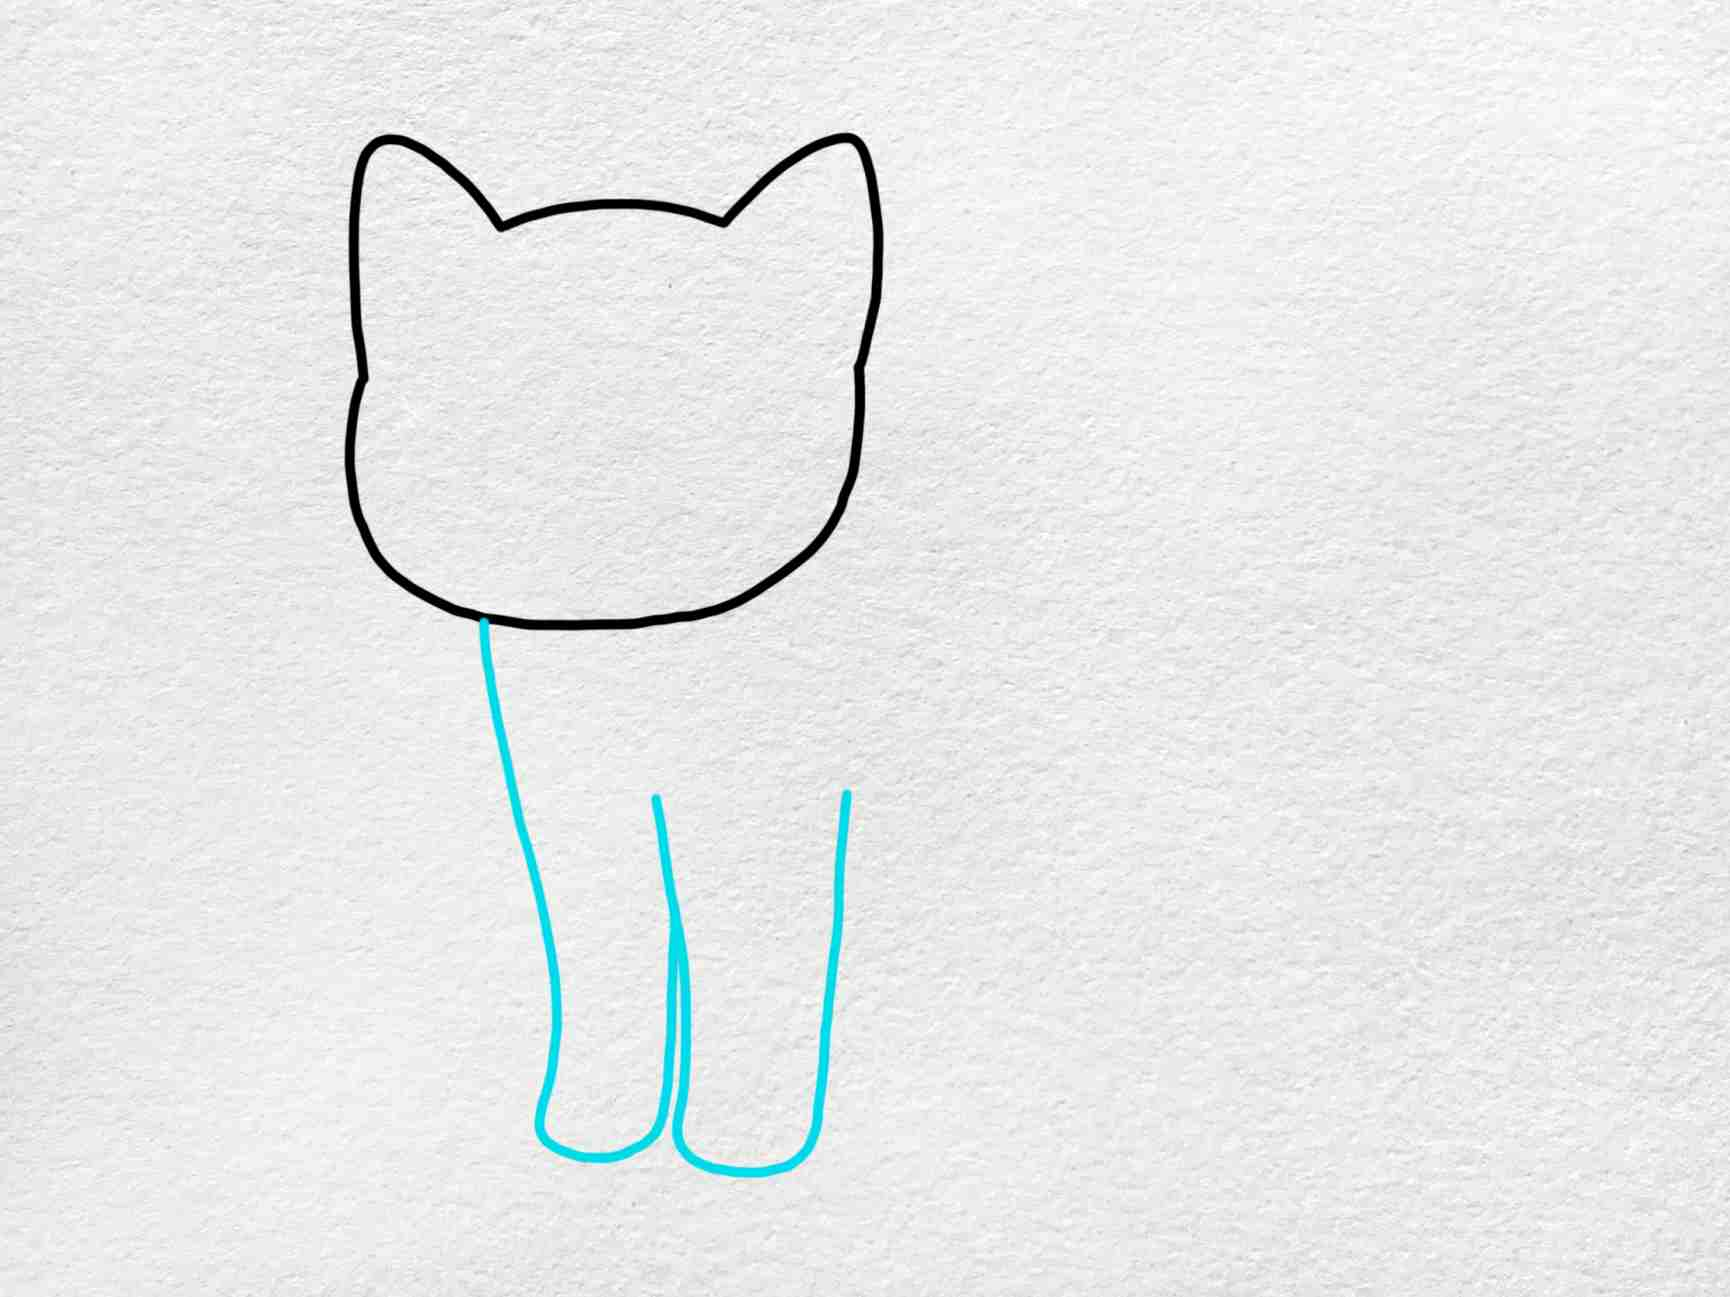 Cute Kitty Drawing: Step 2